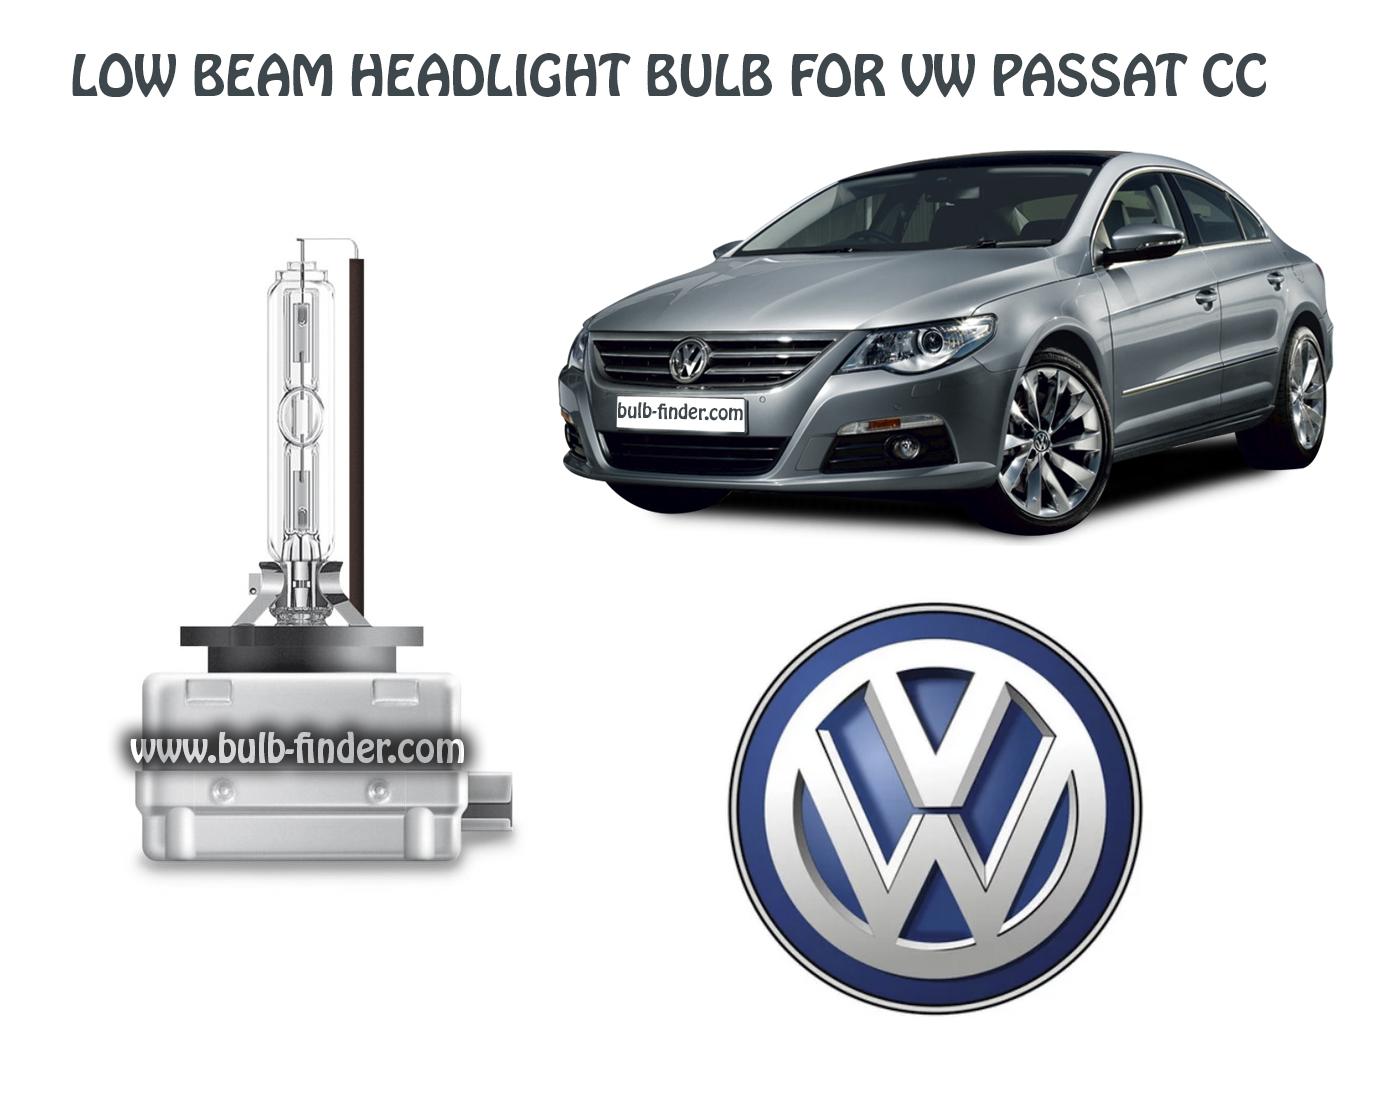 VW Passat CC bulb model LOW BEAM specification